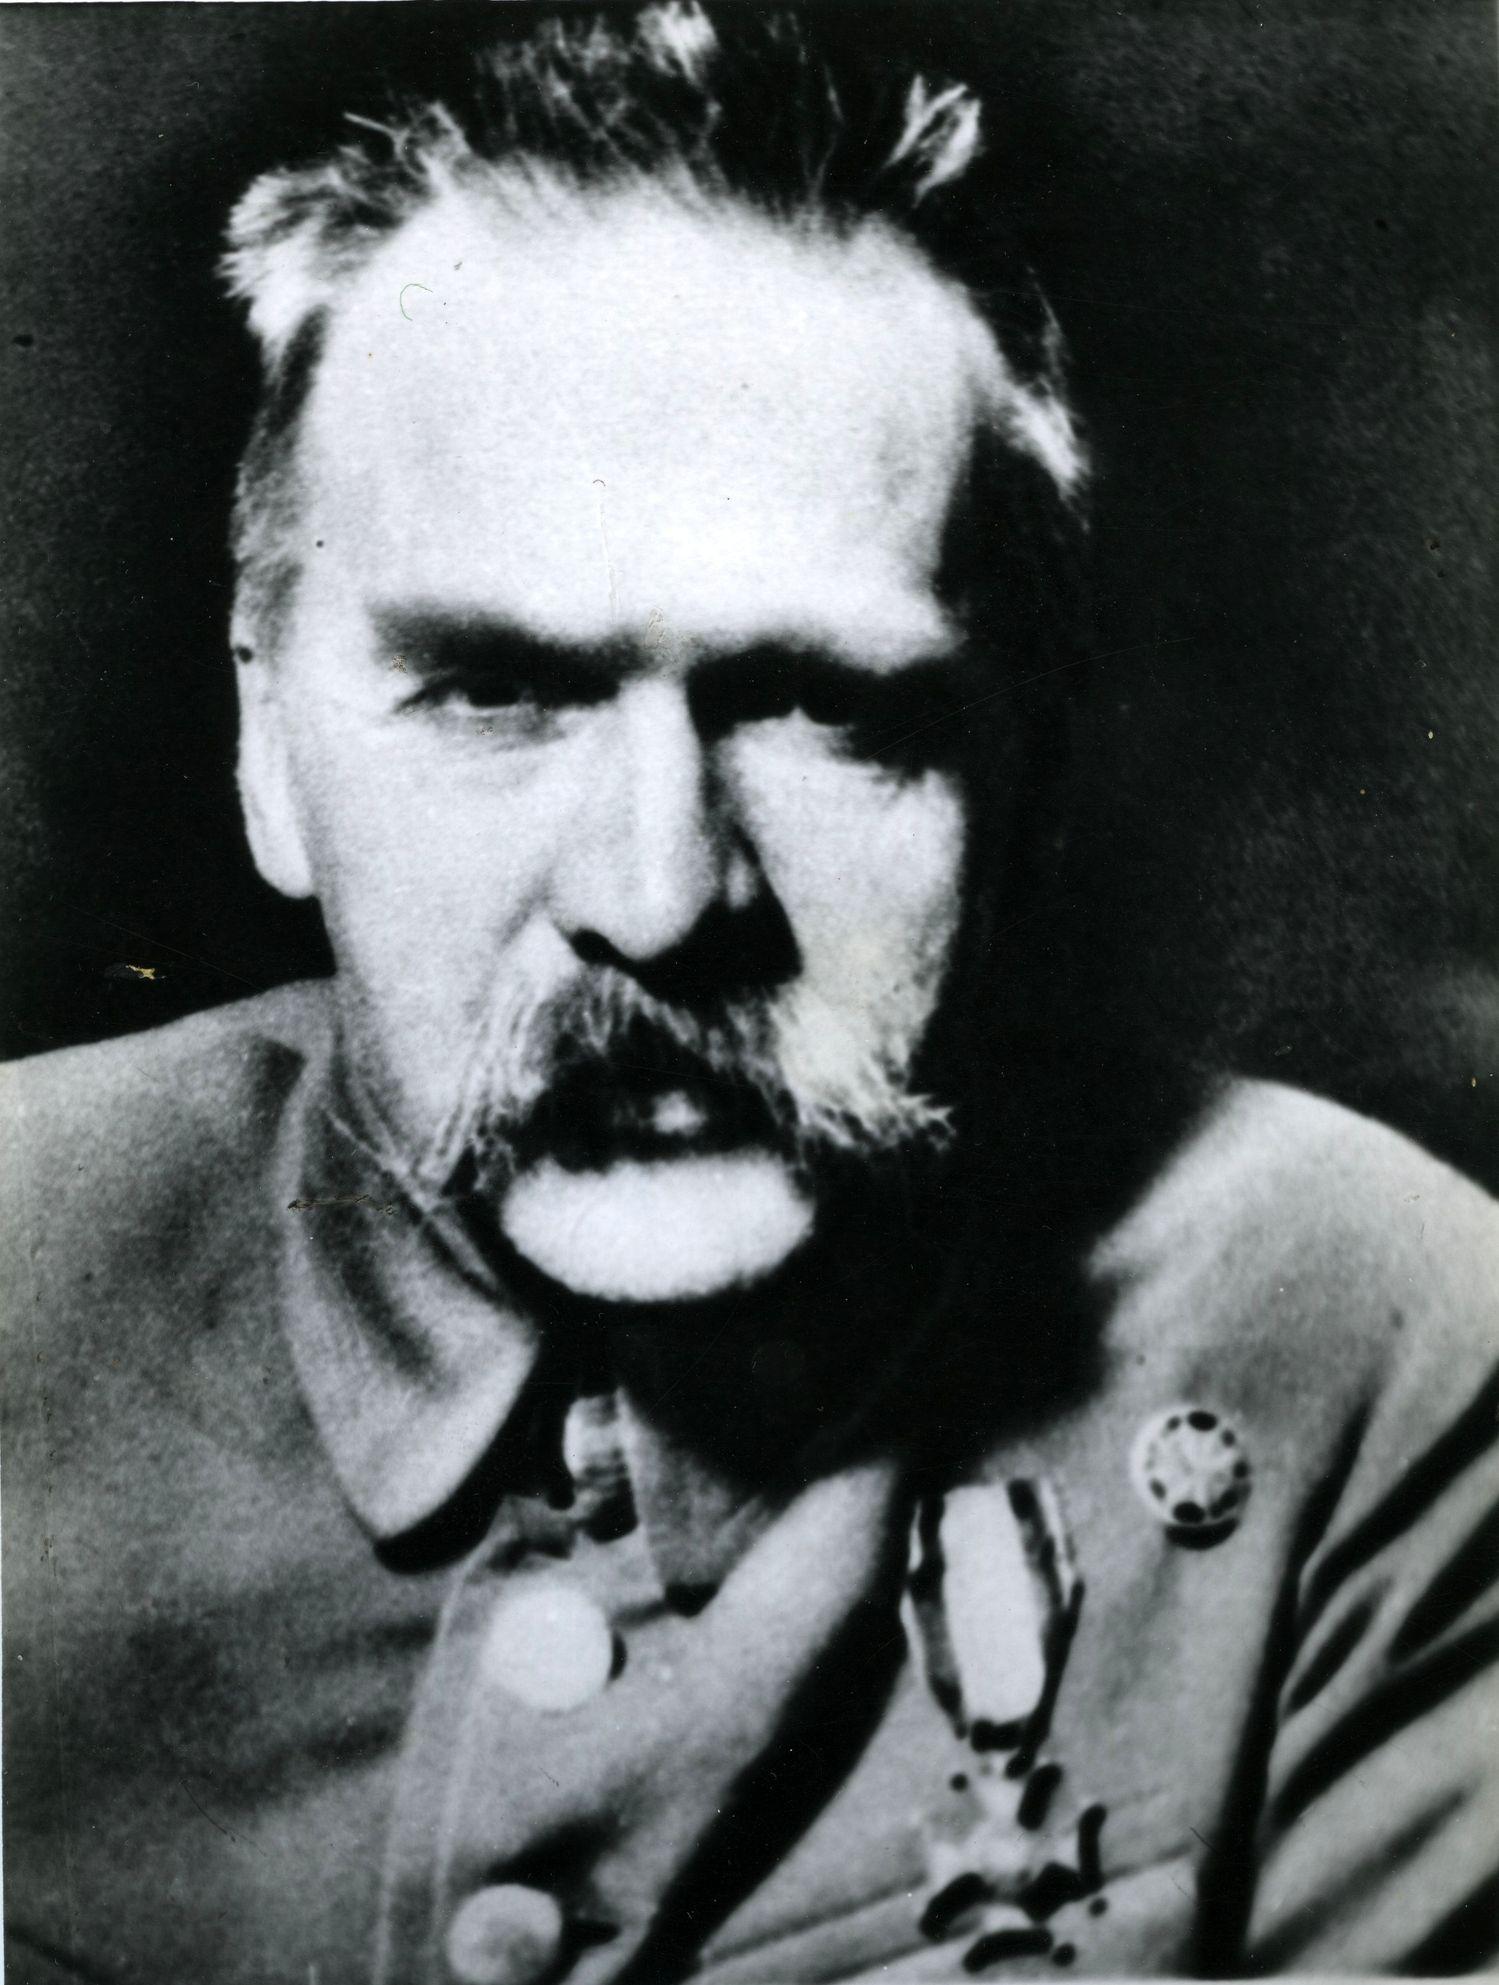 <div class='inner-box'><div class='close-desc'></div><span class='opis'>Józef Piłsudski - portret w ujęciu popiersiowym.</span><div class='clearfix'></div><span>Cote du document FIL03162</span><div class='clearfix'></div><span>© Instytut Literacki</span></div>